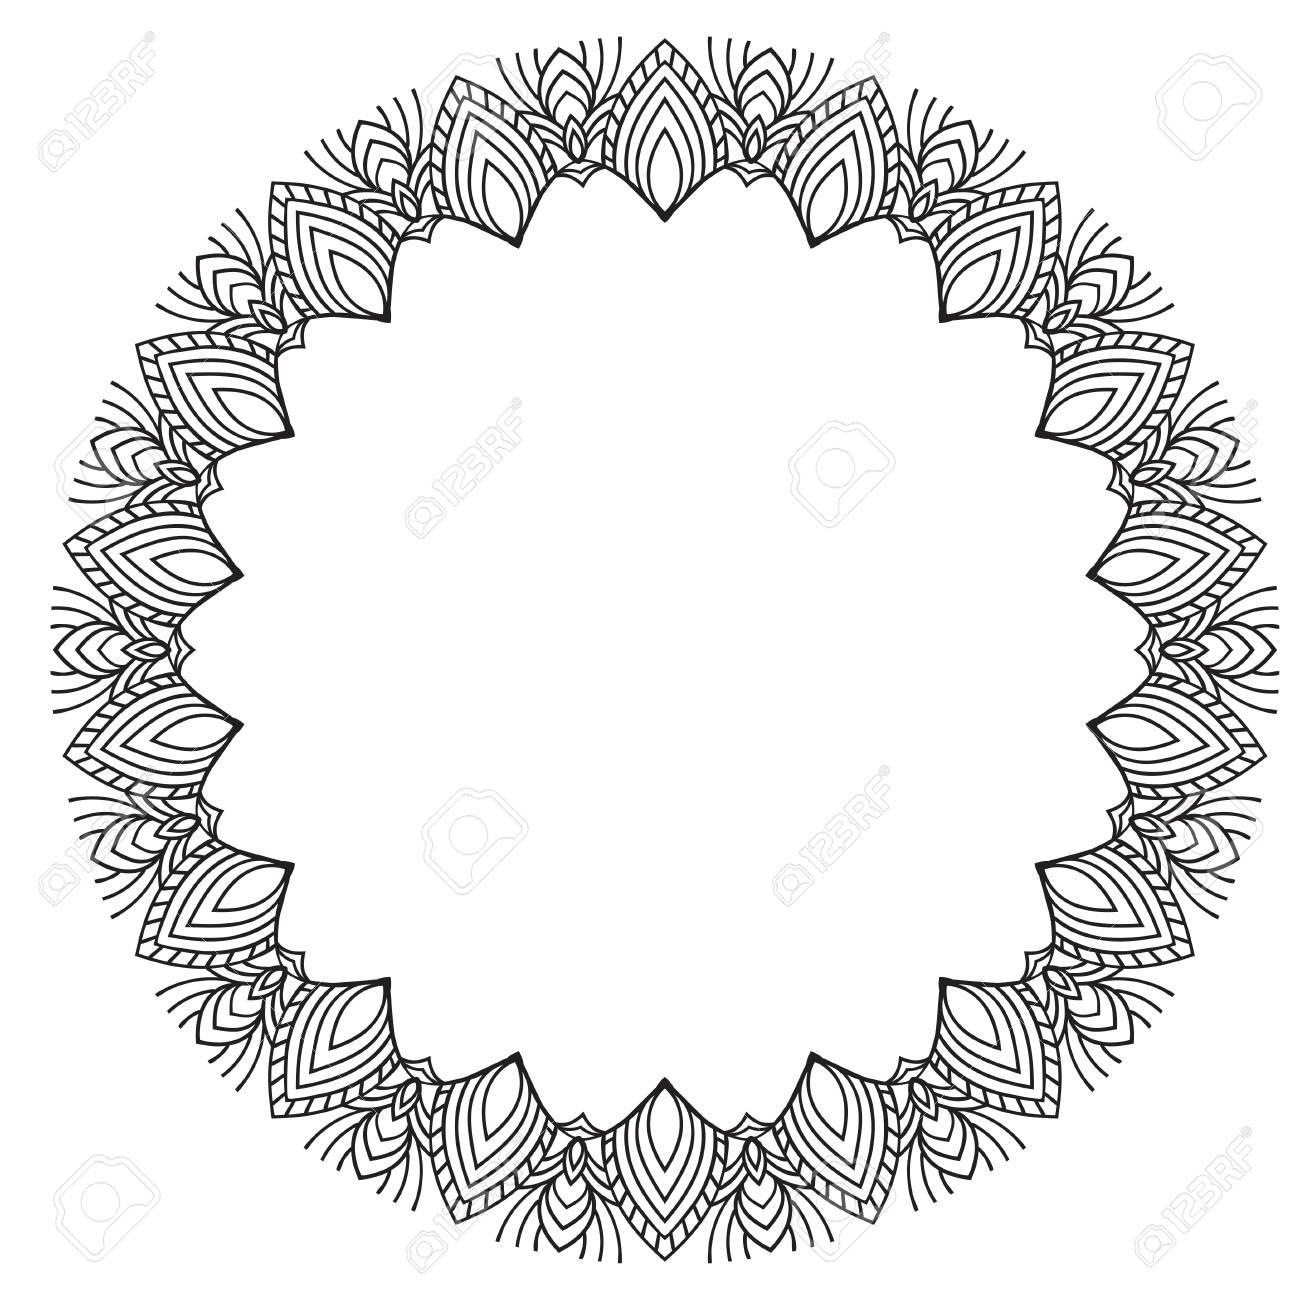 Cadre De Dessin A La Main Noir Et Blanc Fleur Mandala Vector